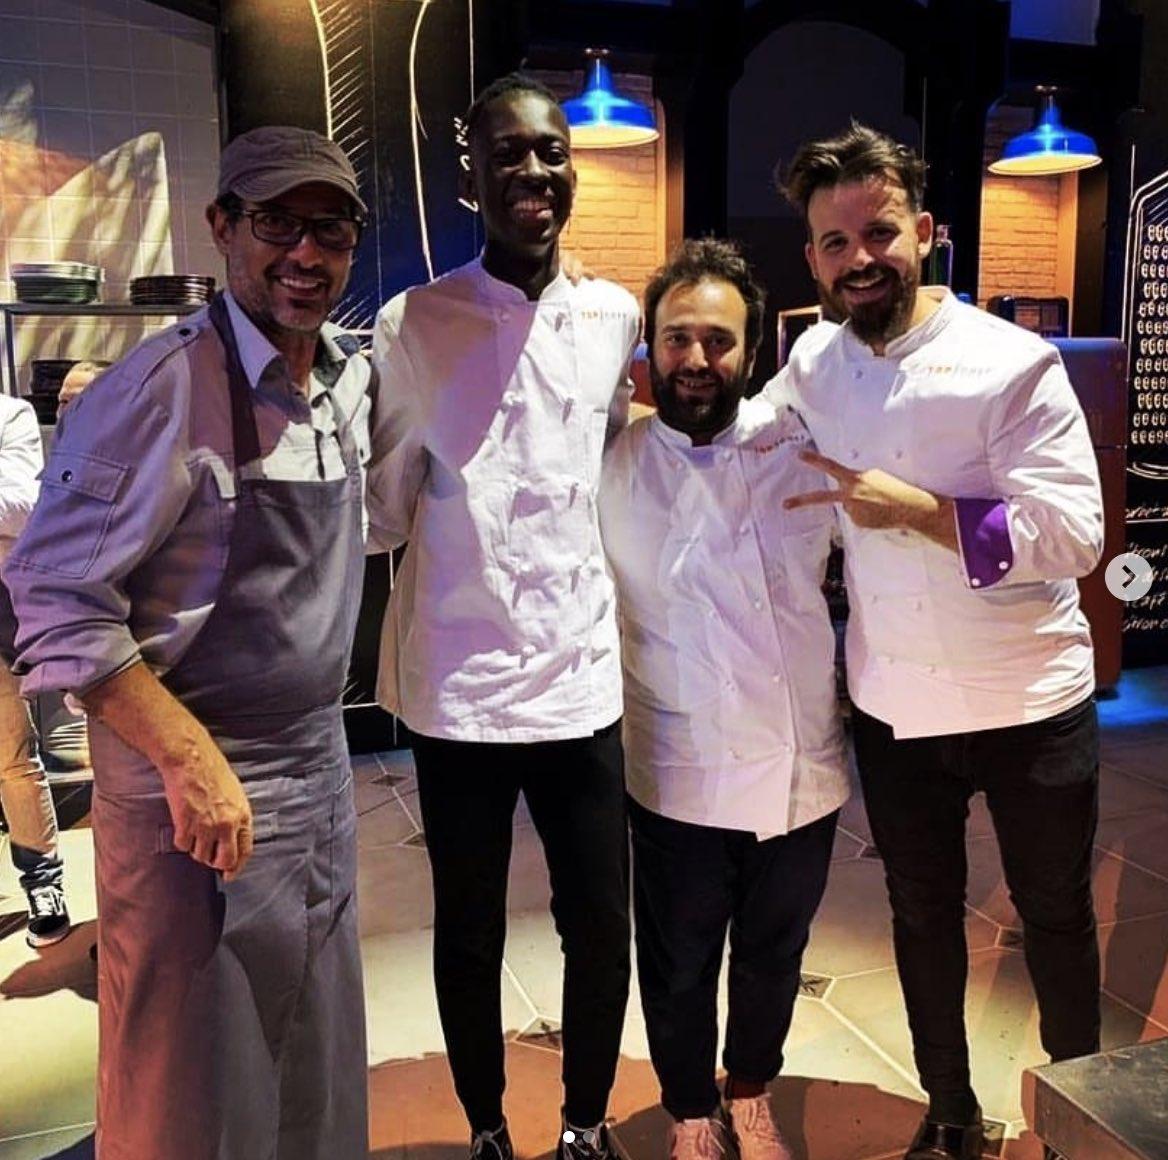 Top Chef 11 - Top Chef - Paul Pairet - Brigade violet